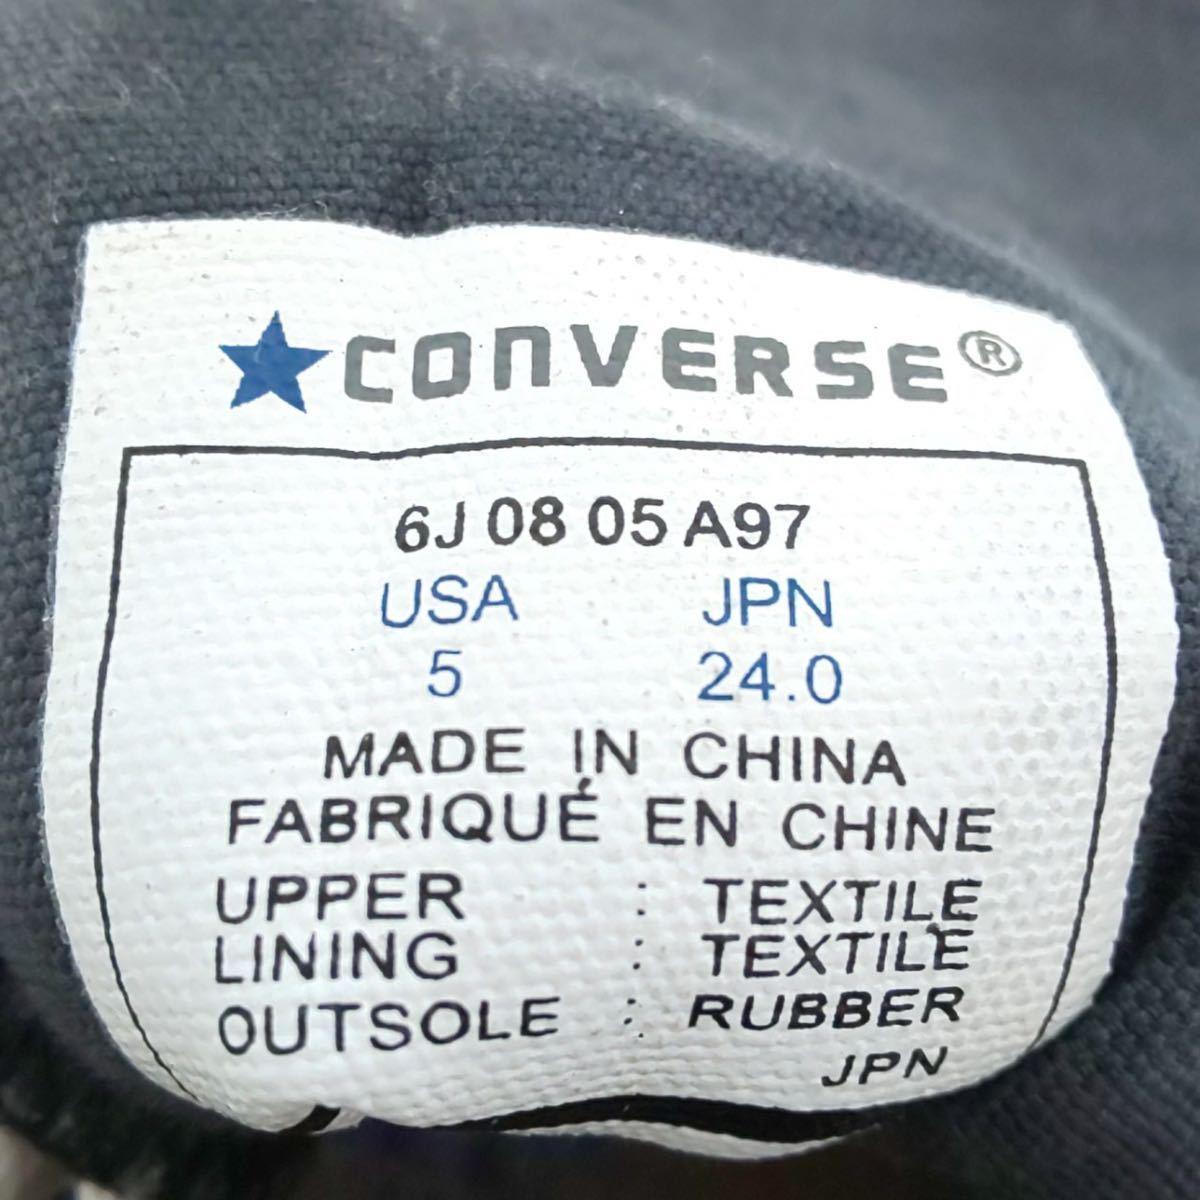 【CONVERSE】コンバースオールスター ALL STAR ハイカットスニーカー キャンバス ドクロ スカル ロック 黒 シルバー 靴 シューズ 24cm/jx_画像8